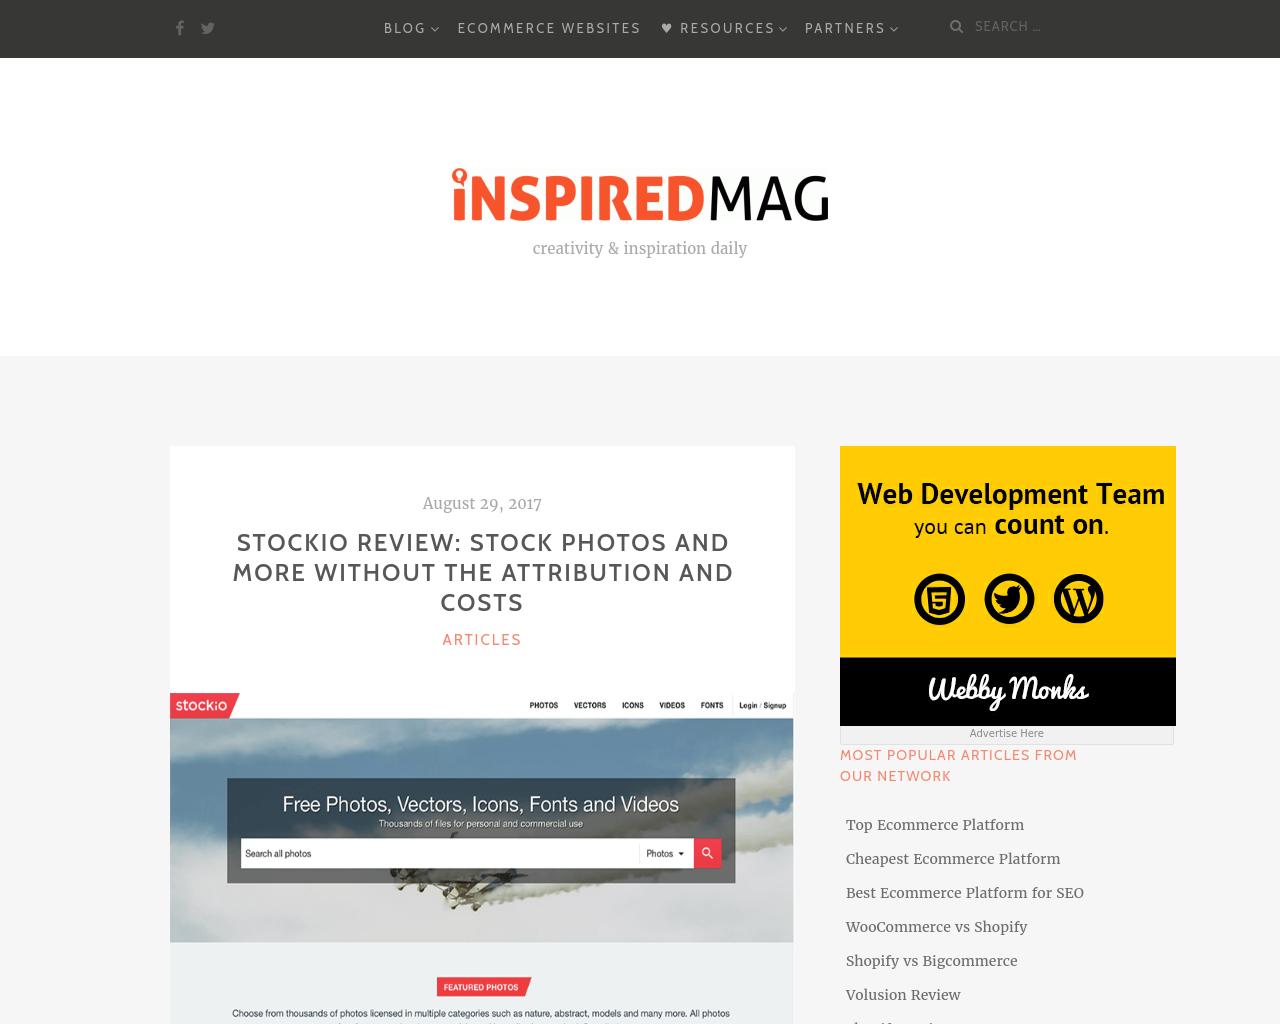 InspiredMag-Advertising-Reviews-Pricing